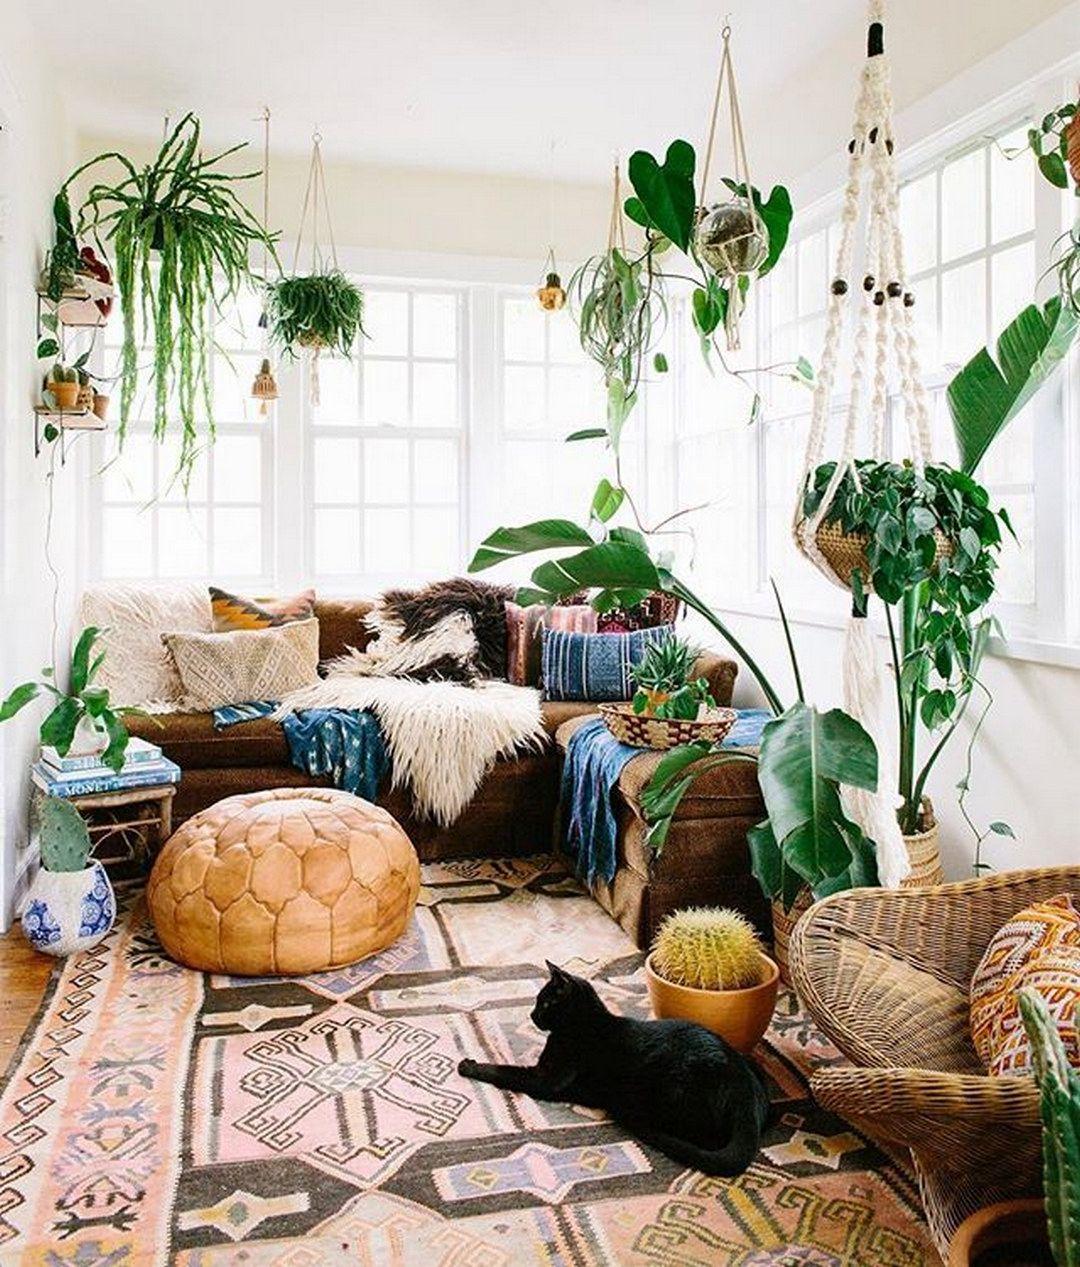 45 Amazing Modern Bohemian Style Bedroom Decor Ideas You ... on Modern Bohemian Bedroom Decor  id=49726